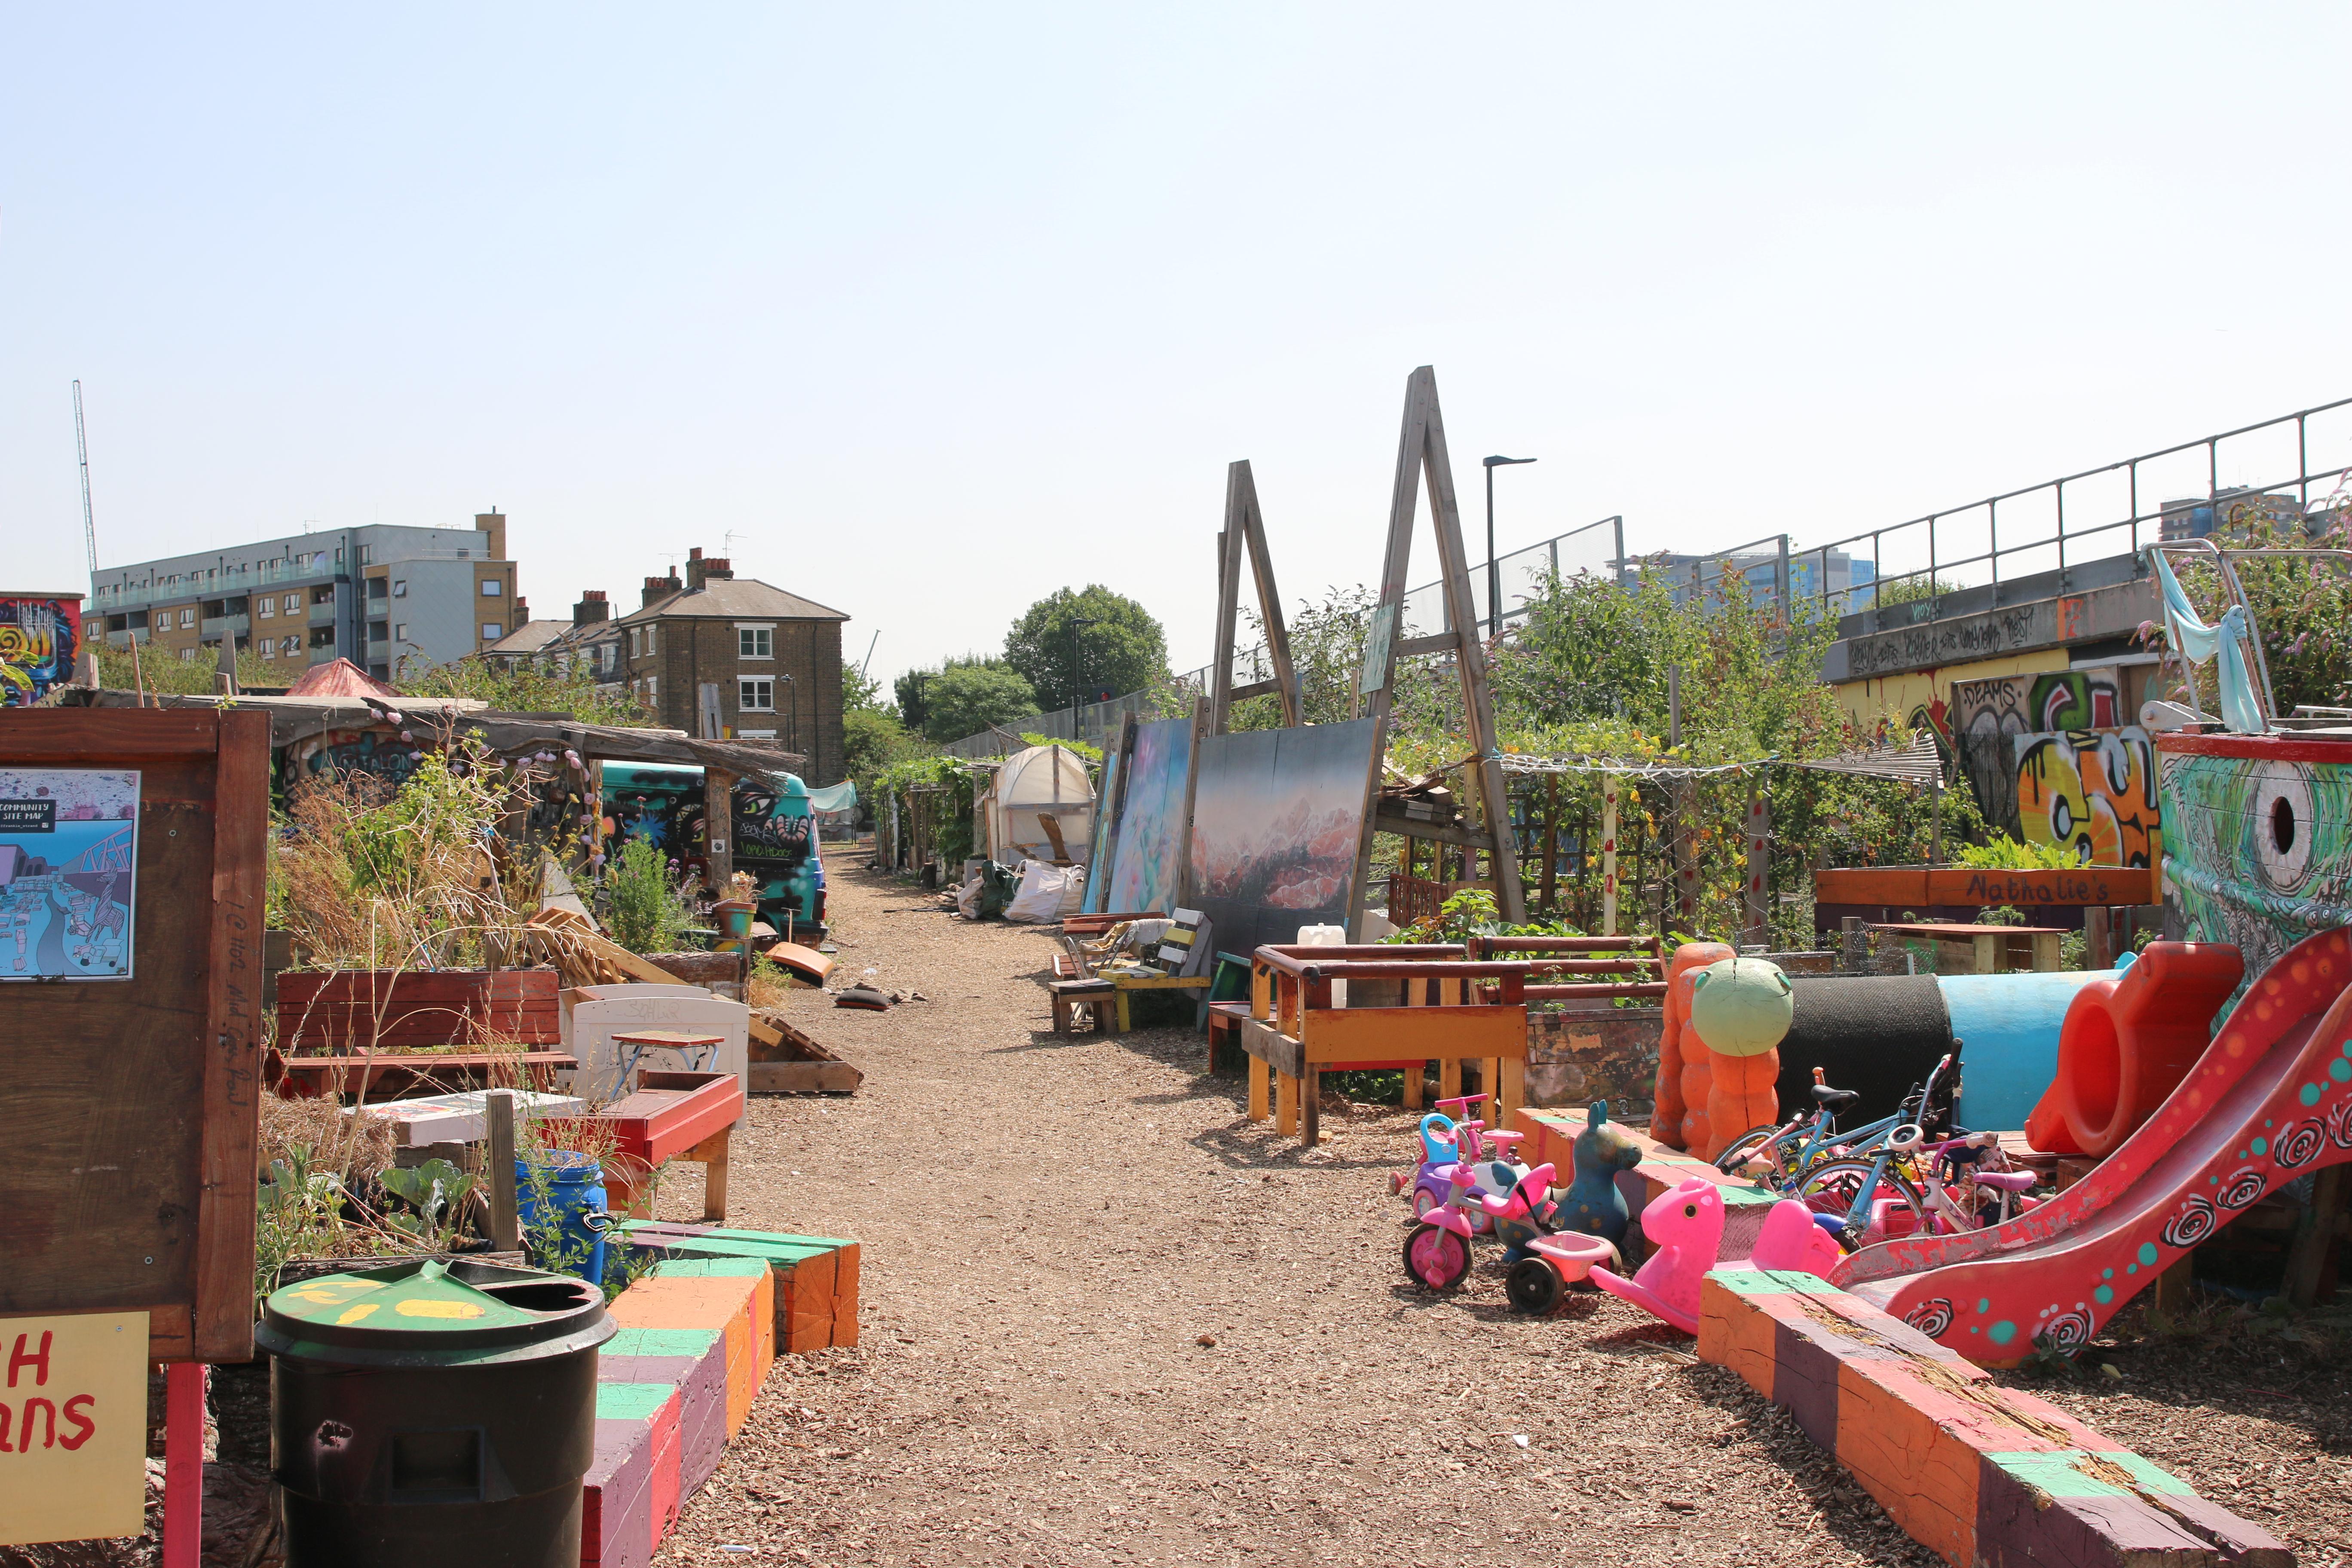 Secret Garden: How A Derelict Space In London Became A Community Garden